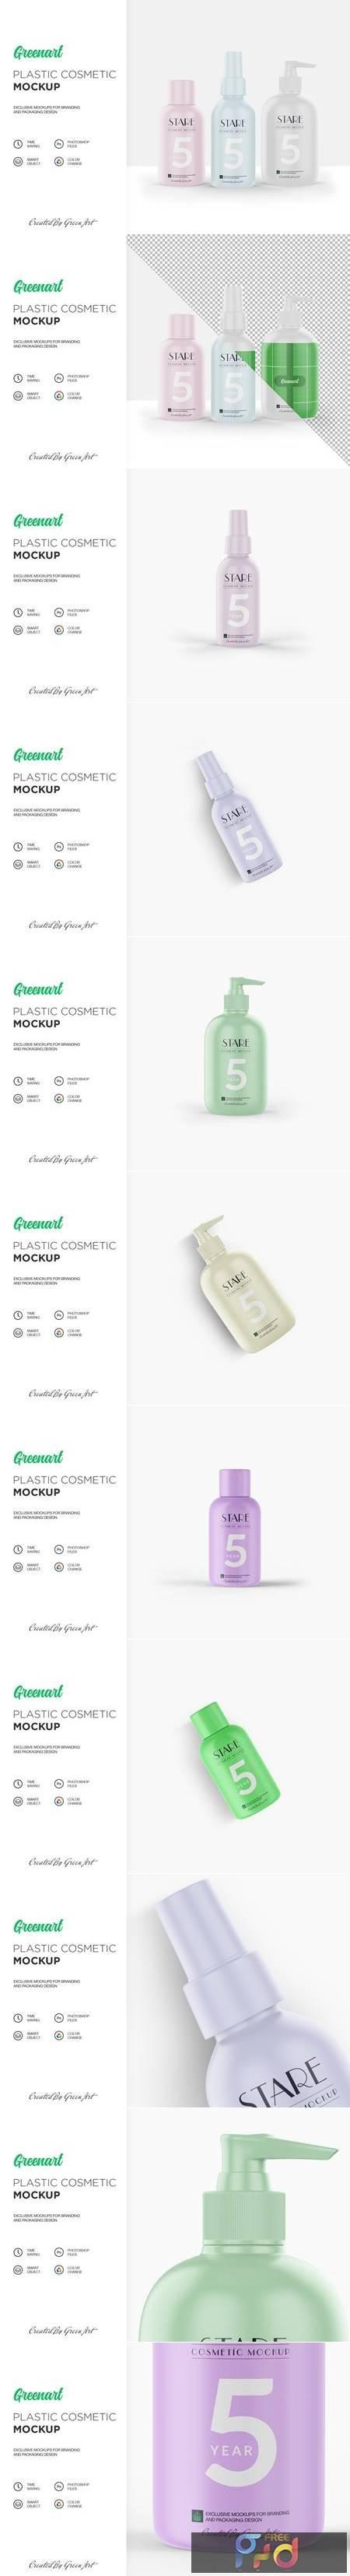 Cosmetic - 7 PSD Mockup 2363765 1